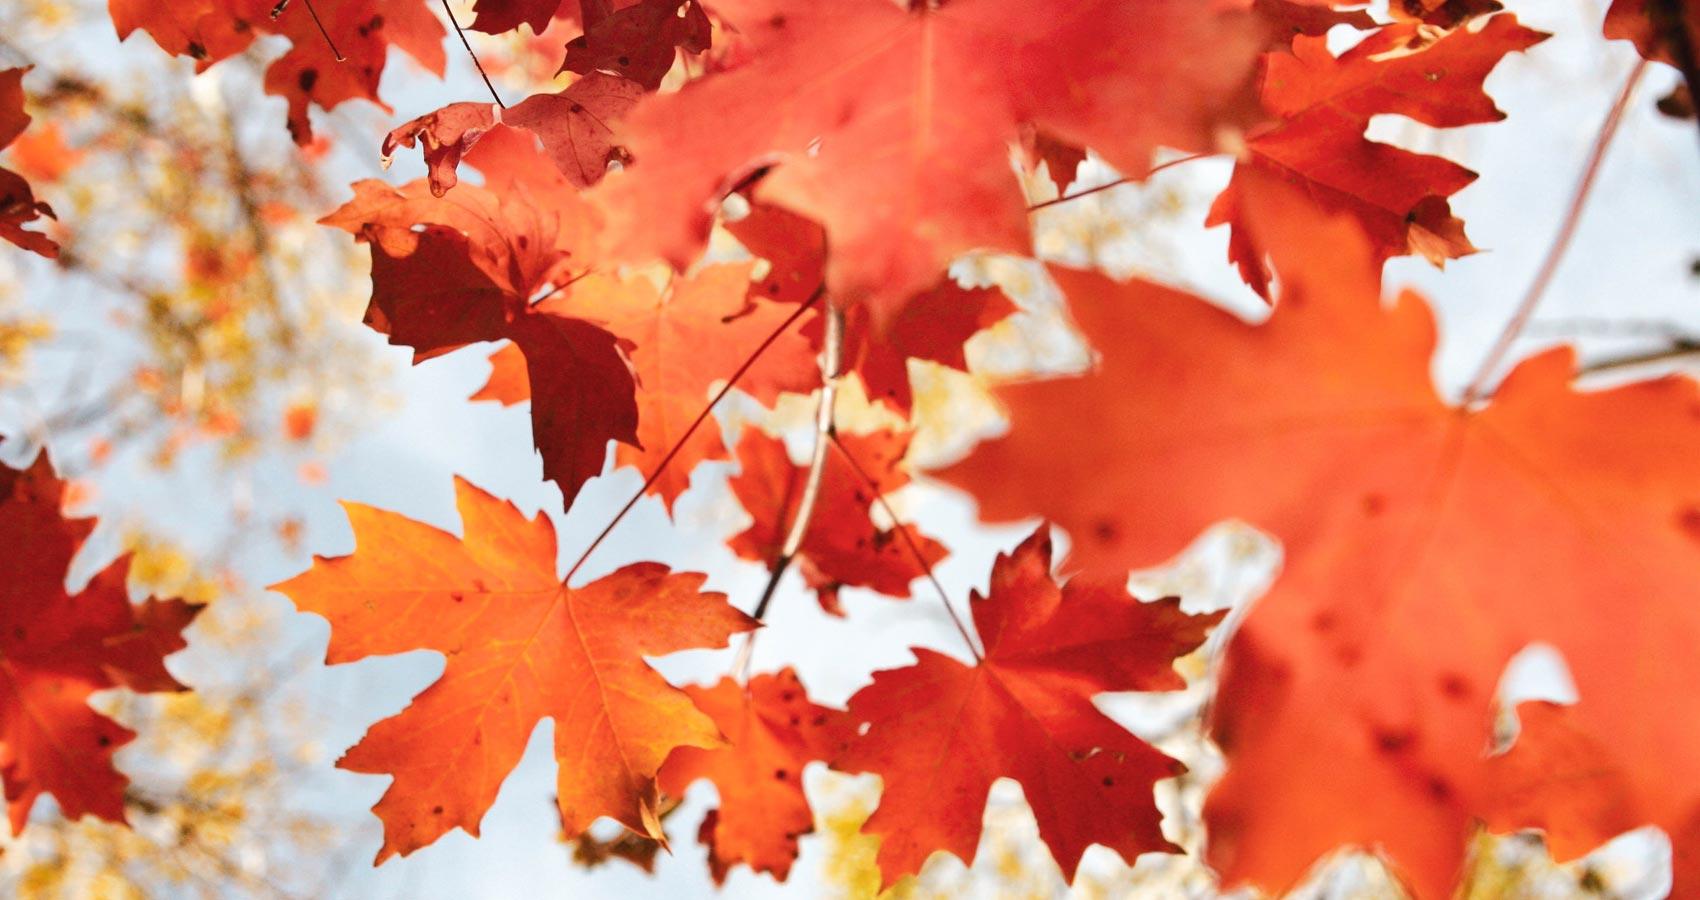 Autumn Leaves, a poem by Srinidhi Jitesh Menon at Spillwords.com